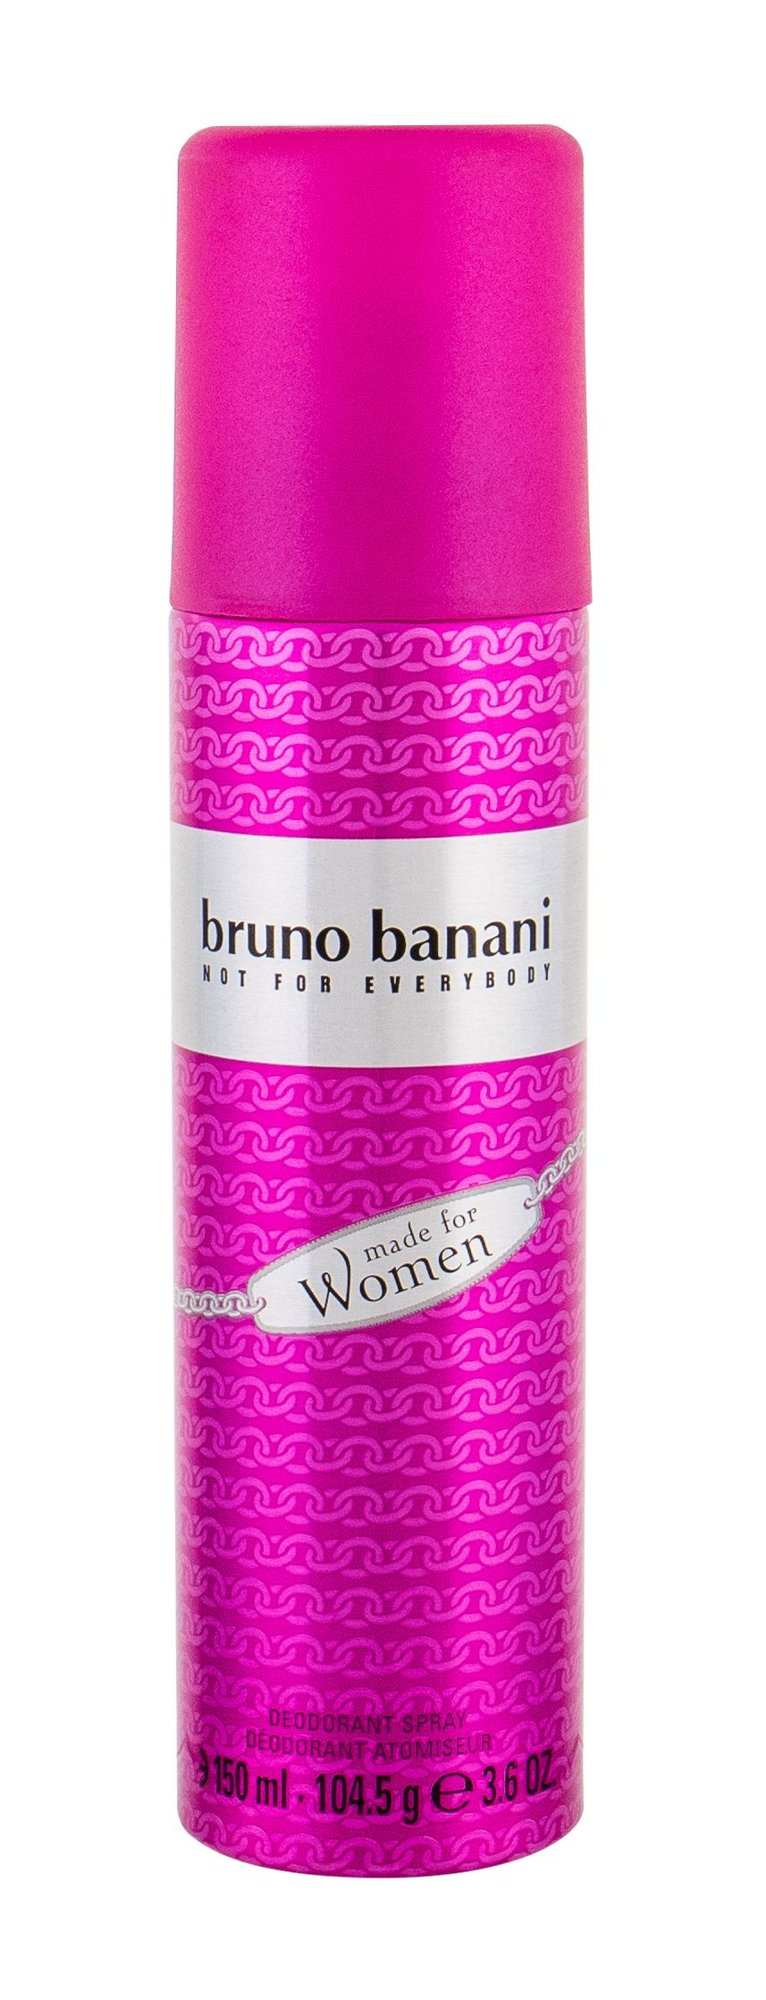 Bruno Banani Made For Women Deodorant 150ml